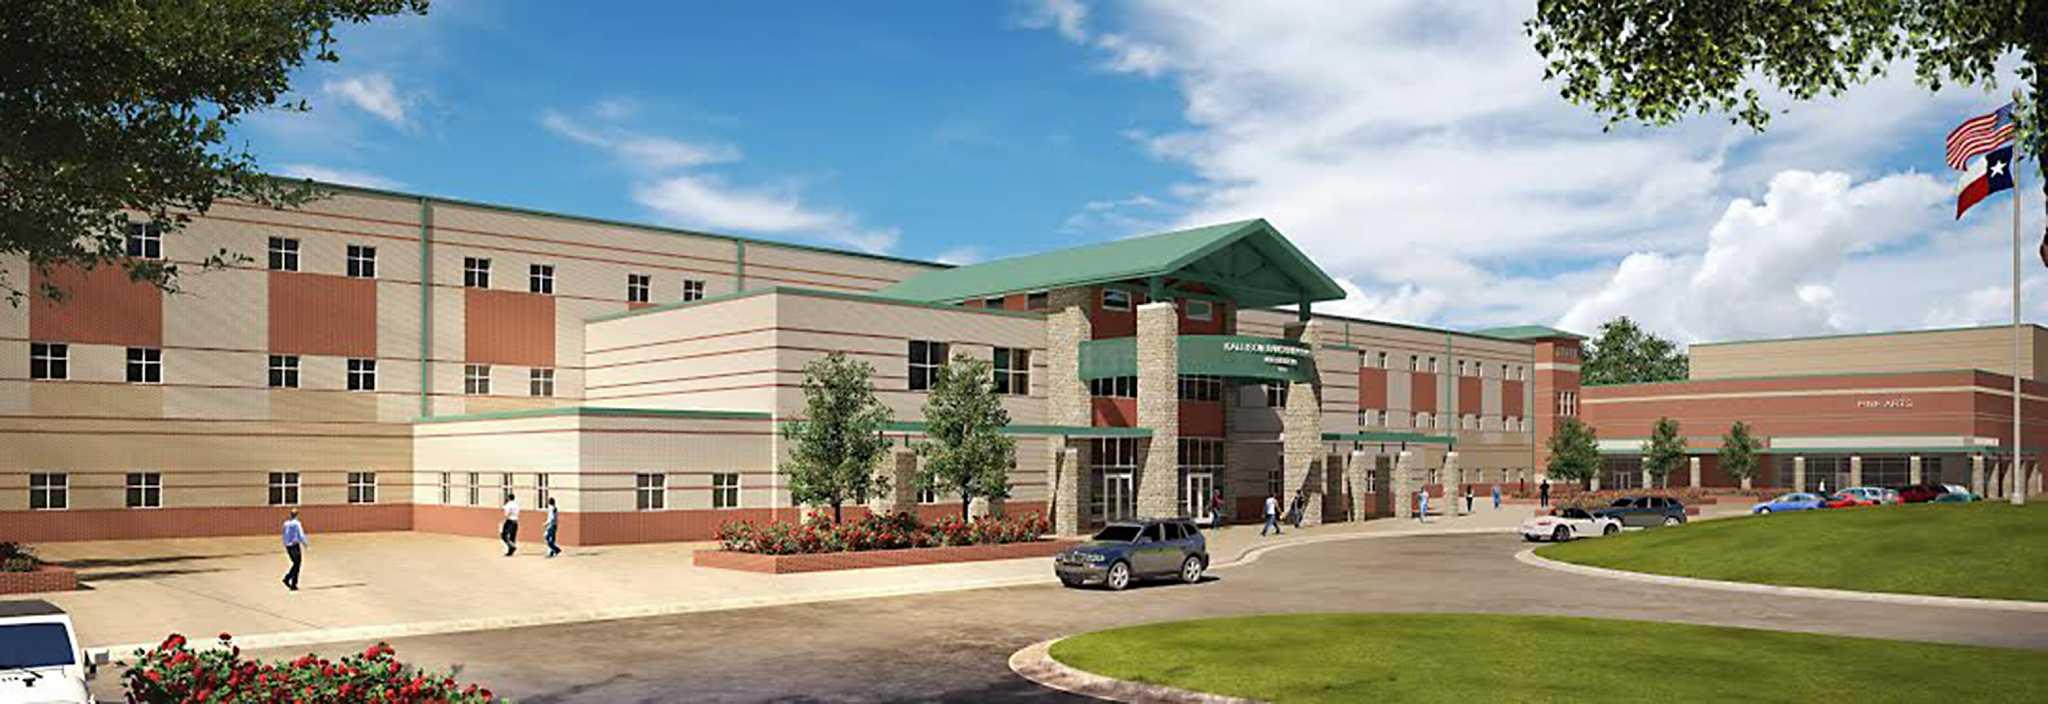 Northside Isd Names New High School San Antonio Express News